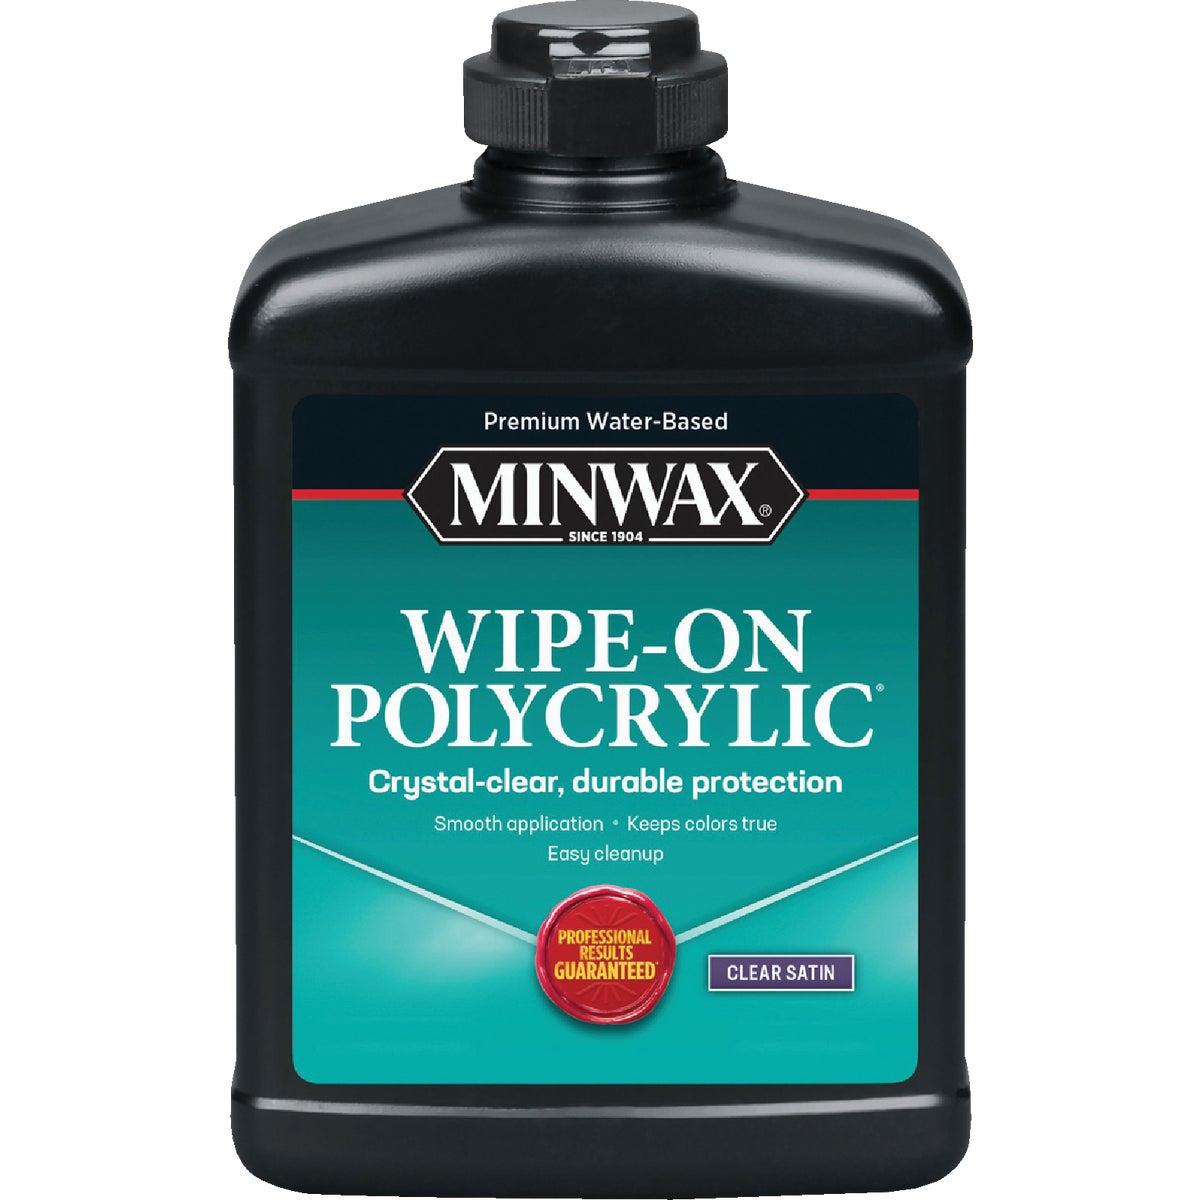 SAT WIPE-ON POLYURETHANE